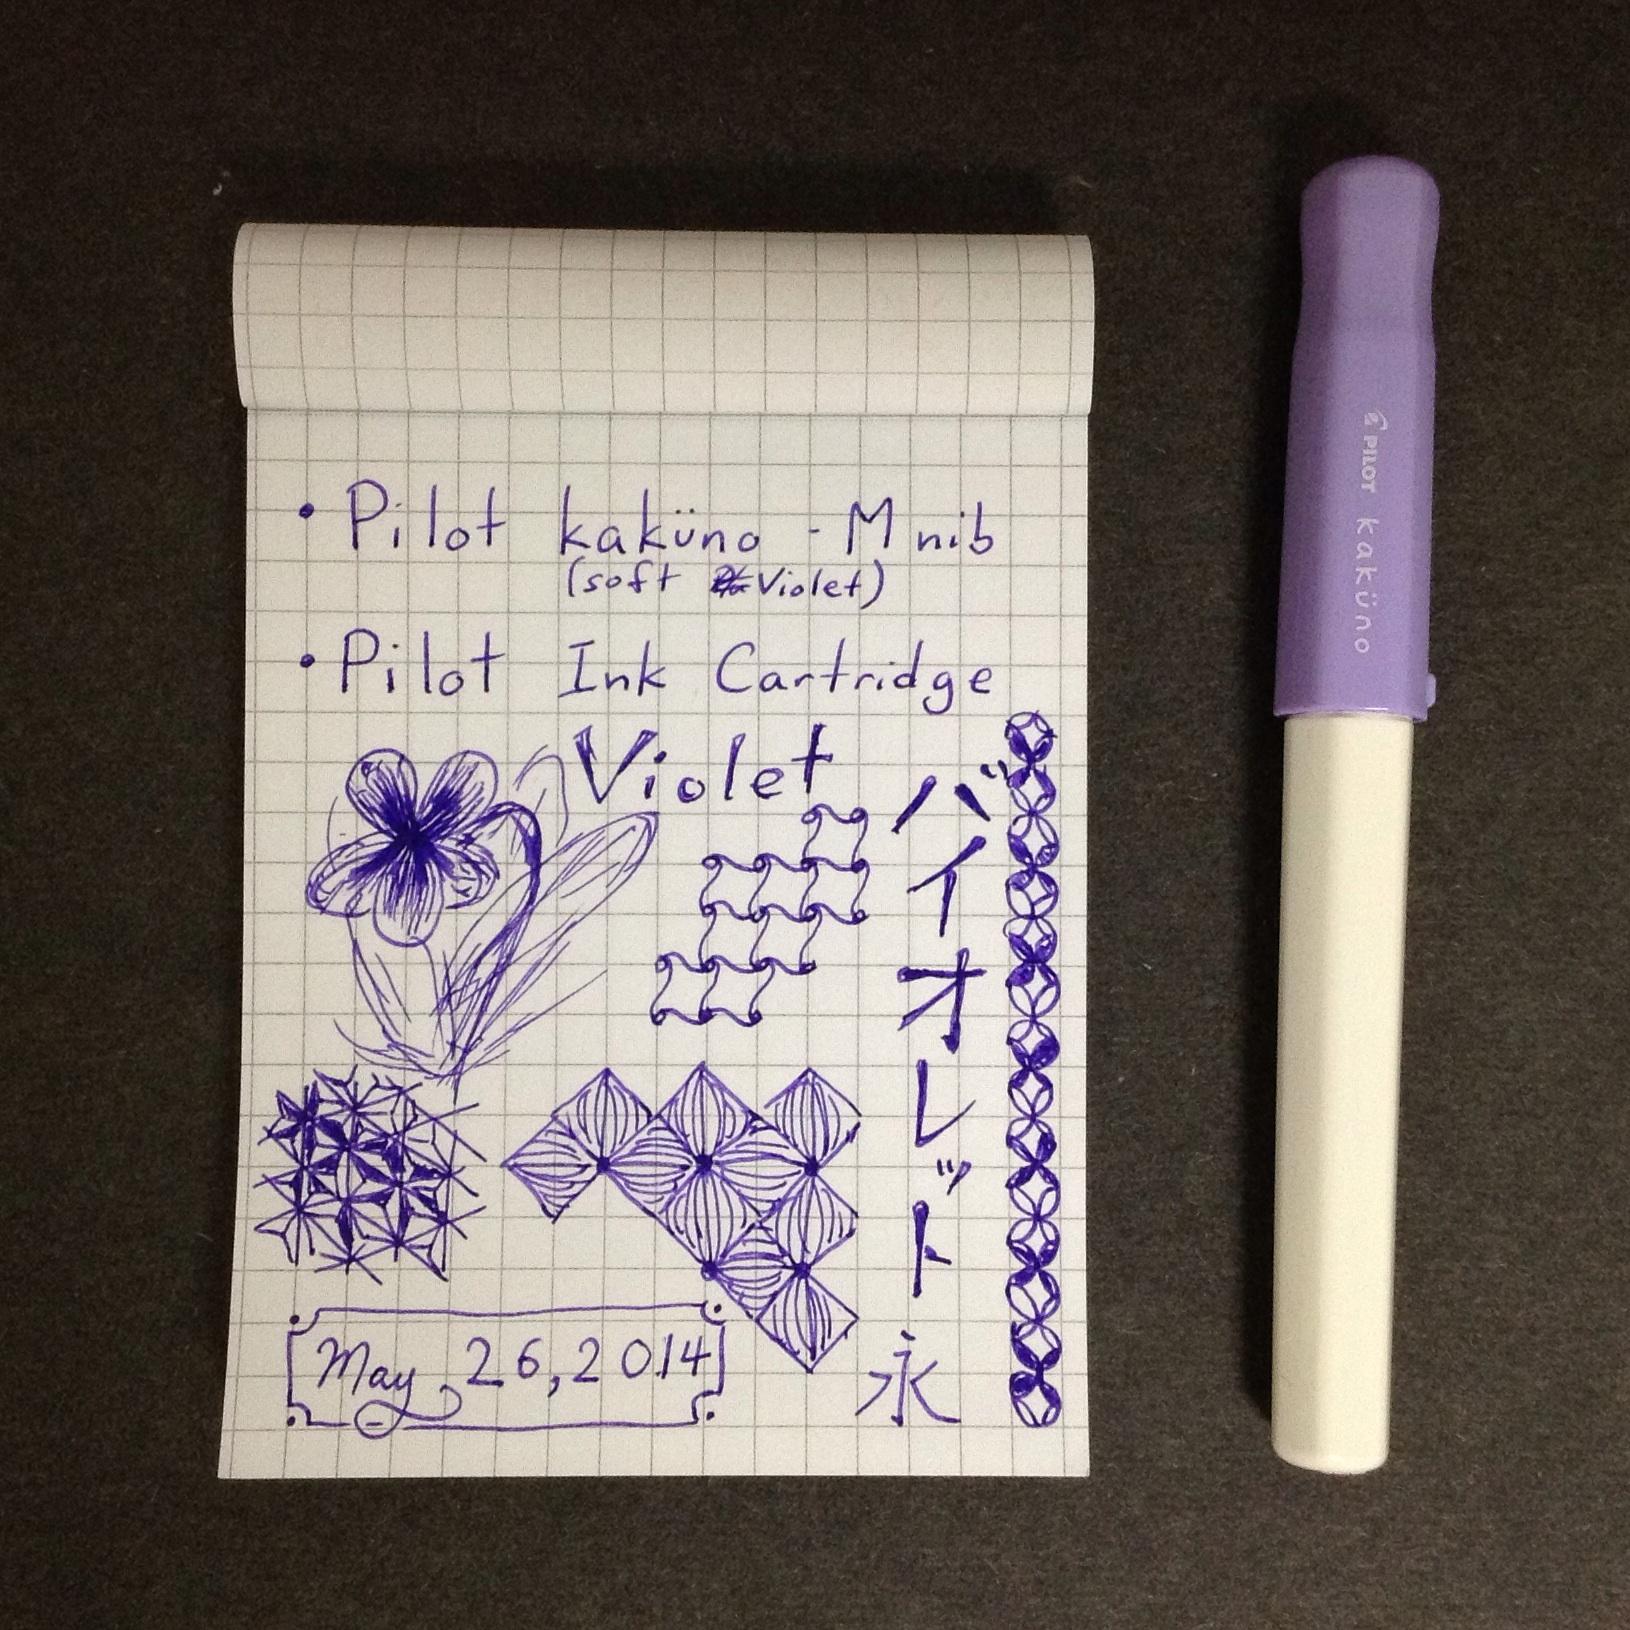 Pilot kakuno -M nib (Soft Violet) w/ Pilot Ink Cartridge (Violet) パイロットカクノ - 中字 (ソフトバイオレット) パイロットインクカートリッジ(バイオレット)